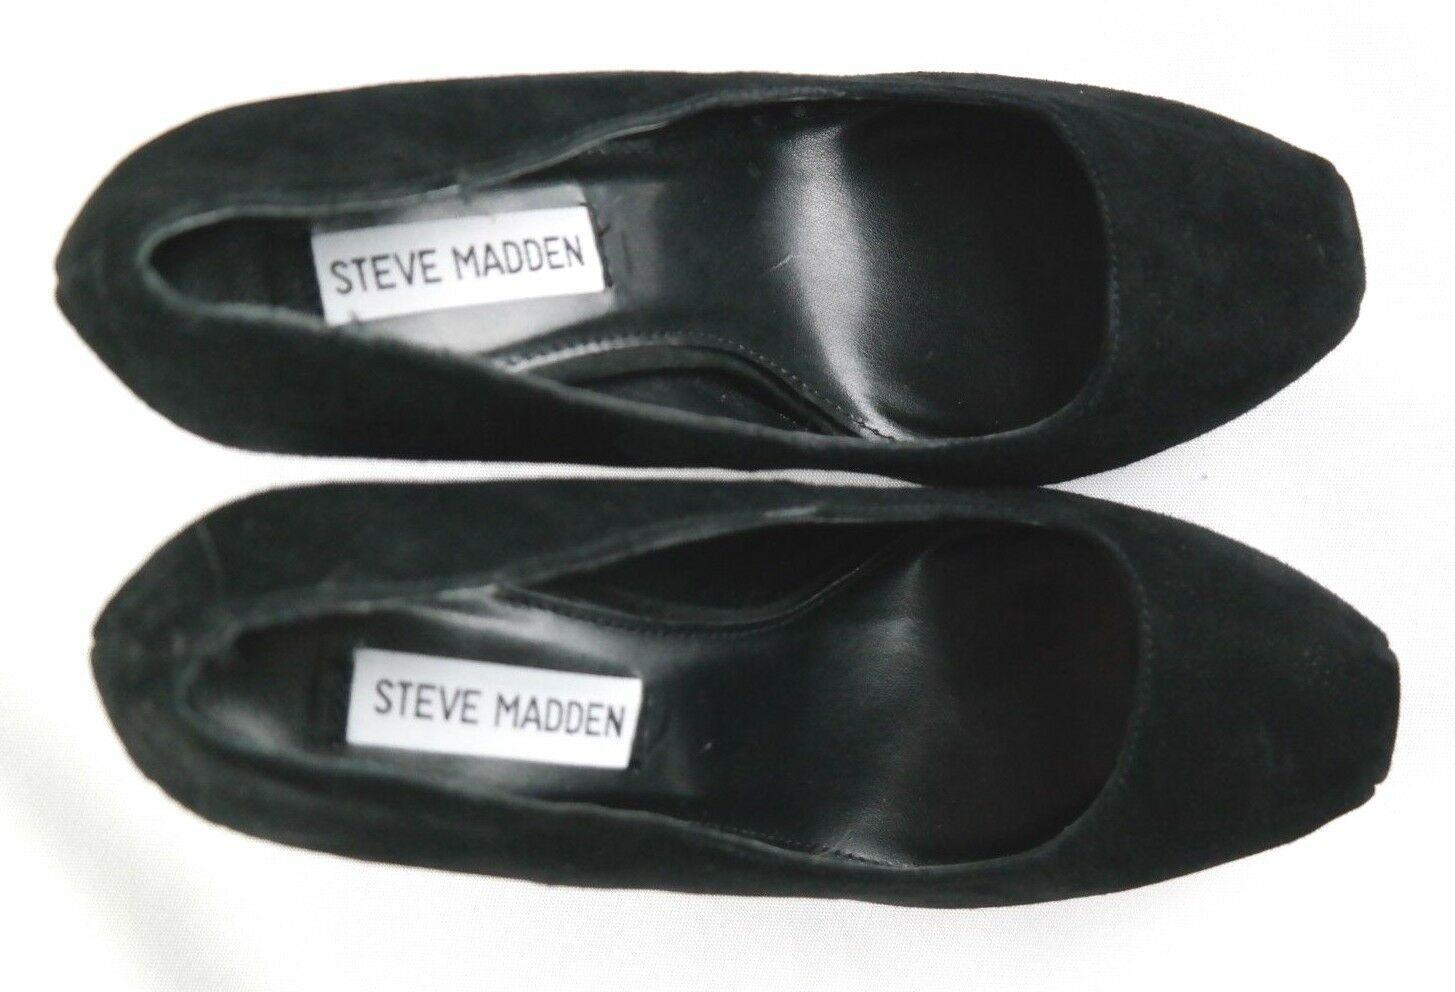 Steve Madden Sarrina Platform Pumps Womens Sz 7.5 Black Suede High Heel Shoes image 9